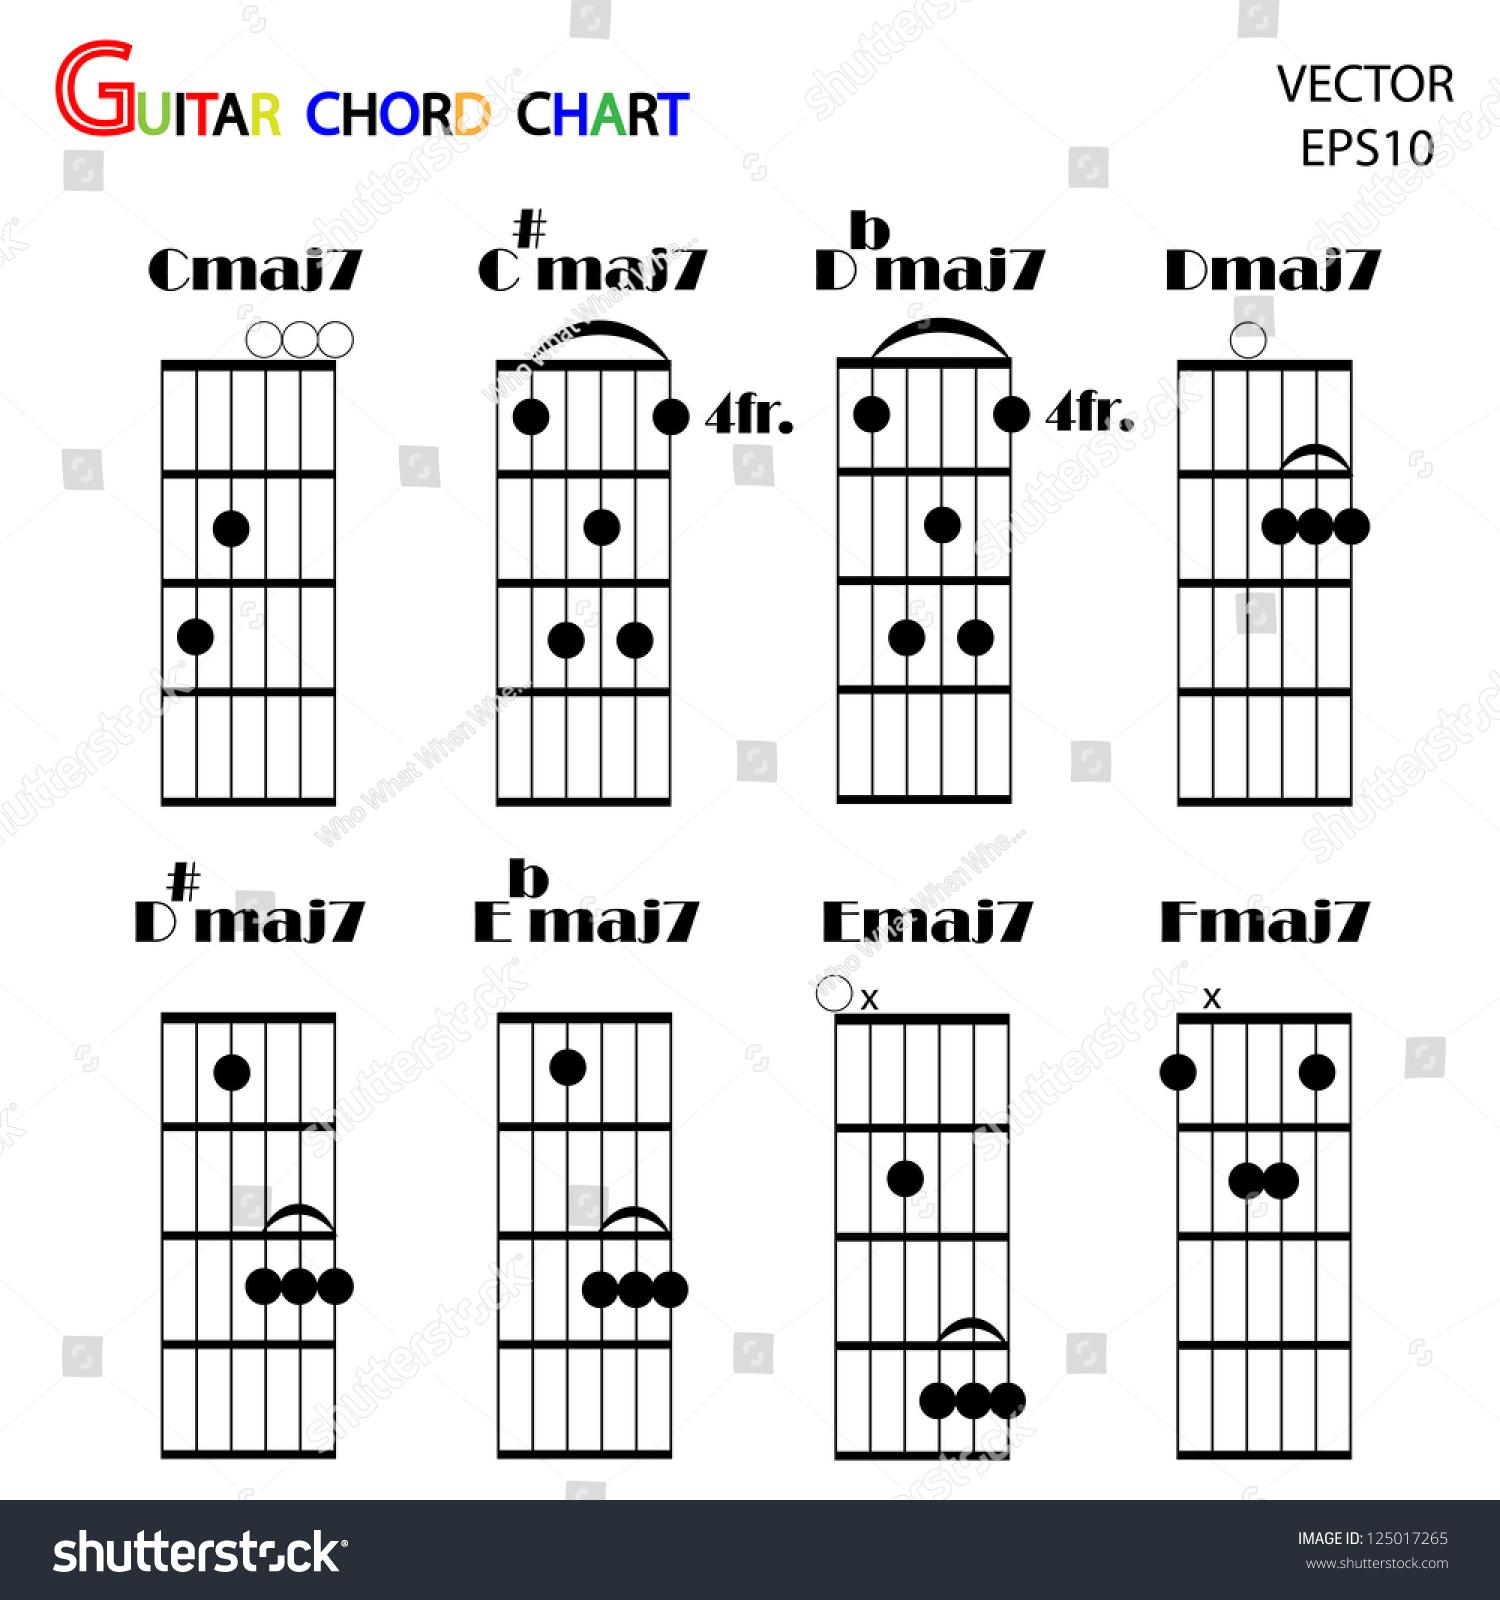 Basic guitar chords tab guitar chordsvector stock vector 125017265 basic guitar chords tab guitar chordsvector hexwebz Image collections